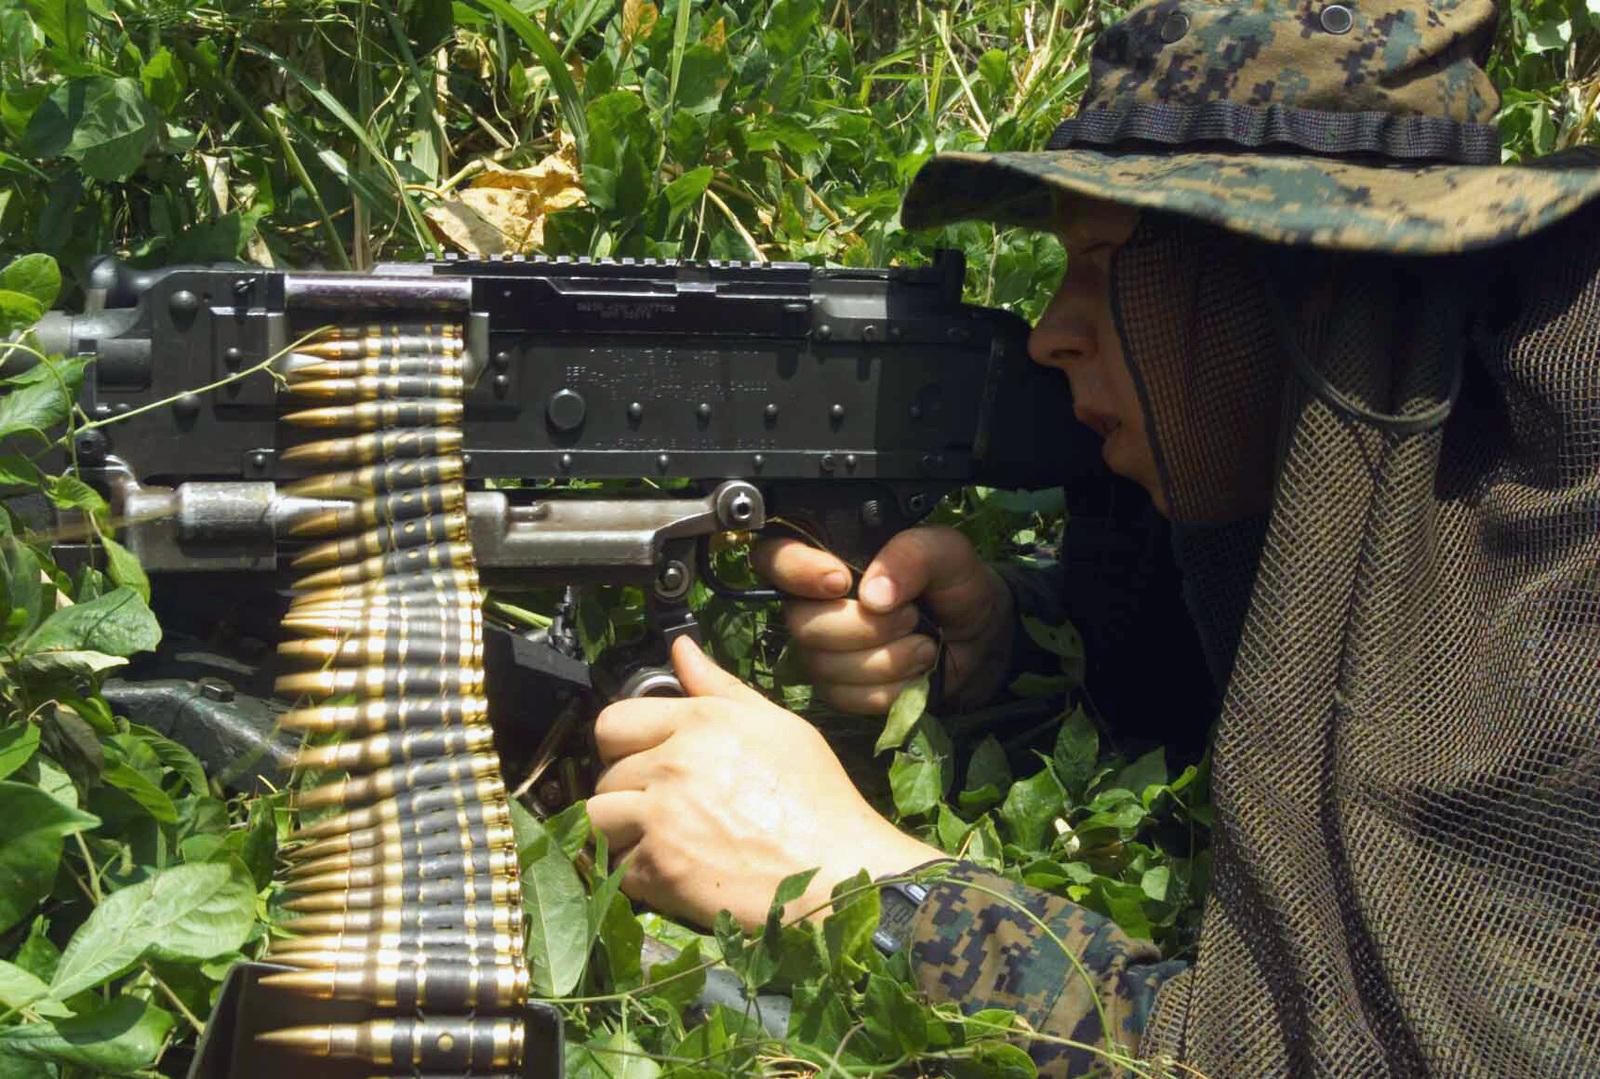 US Marine Corps (USMC) Infantryman Private First Class (PFC